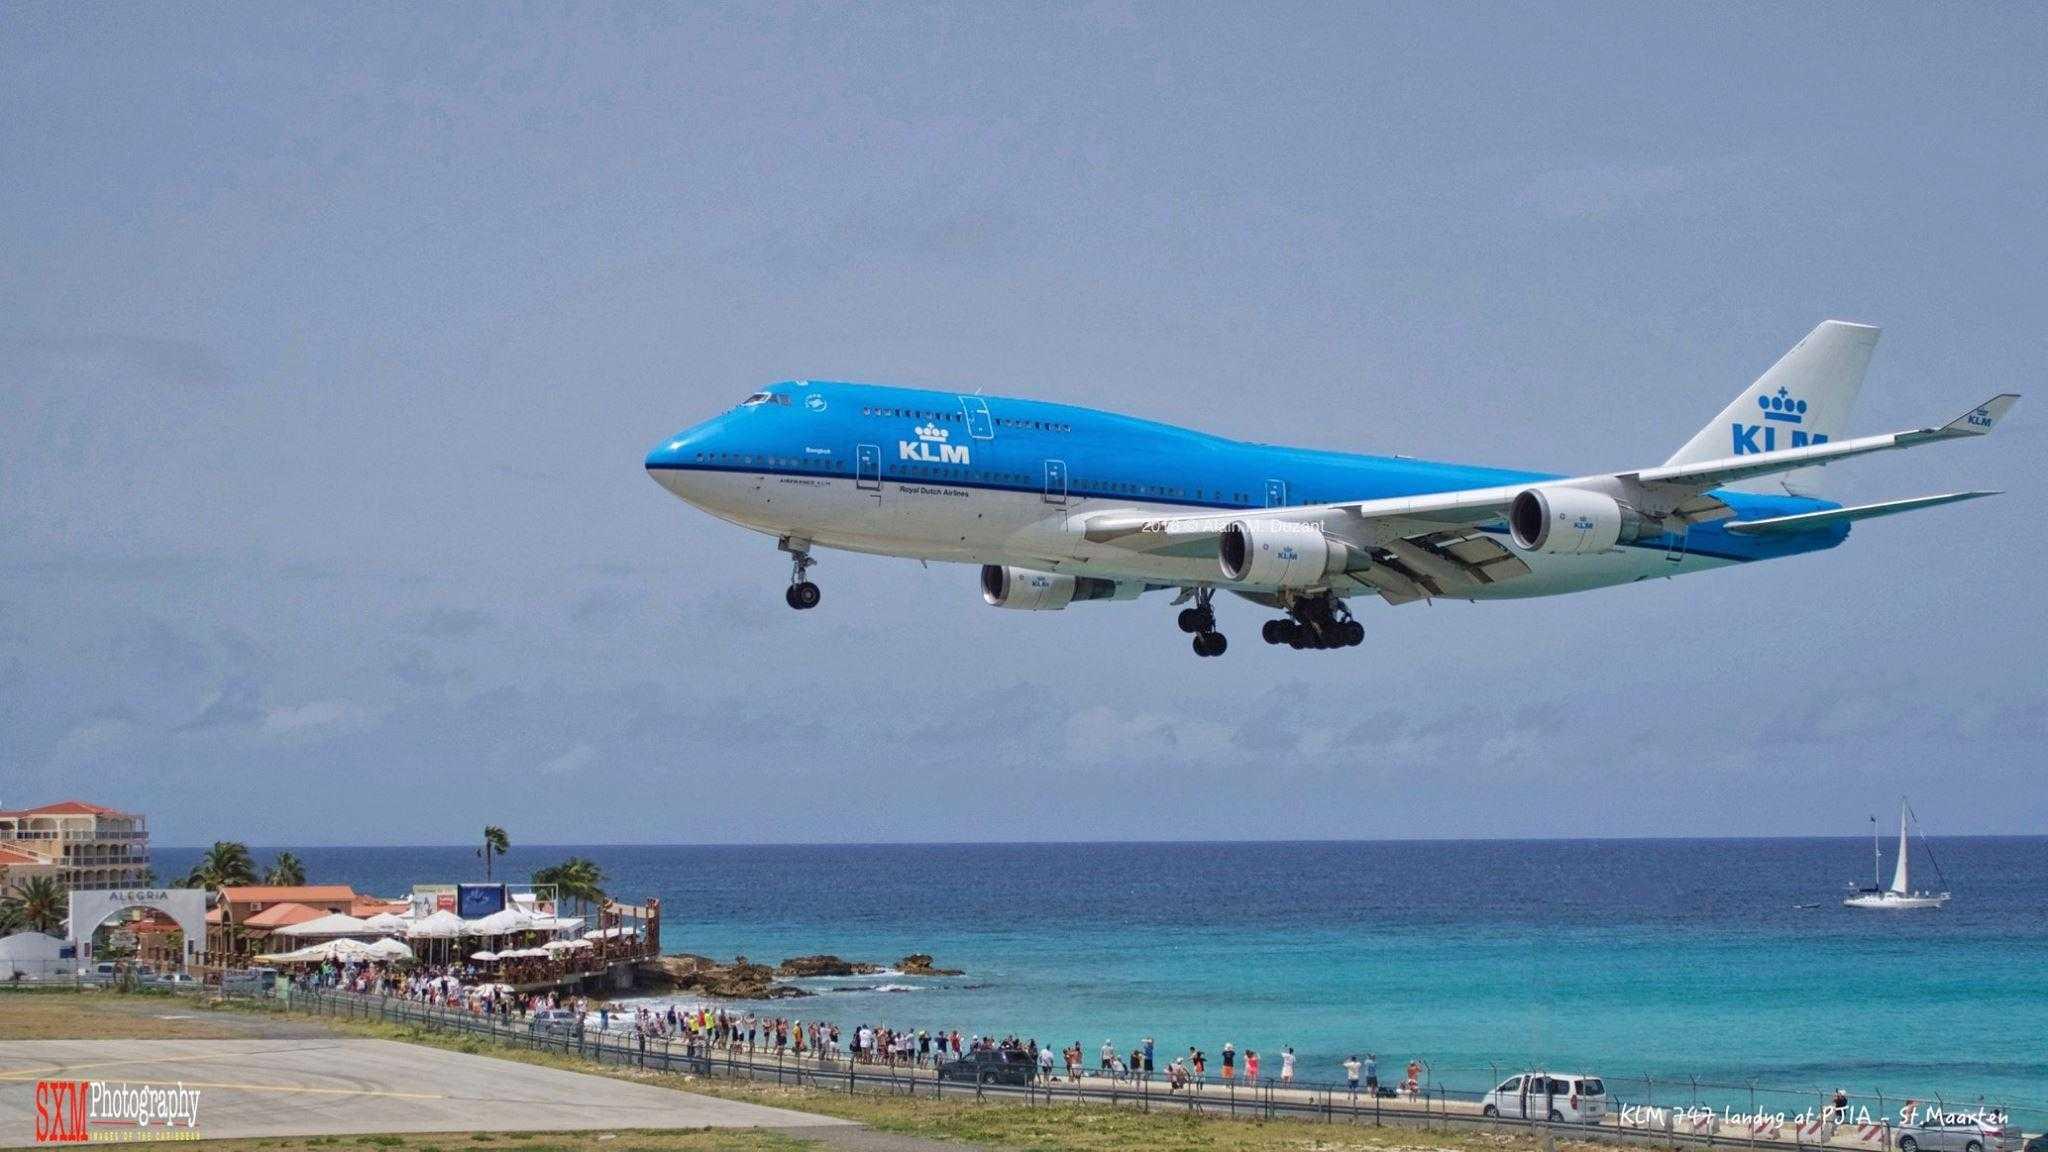 boeing-747-400-klm-sint-maarten-princess-juliana